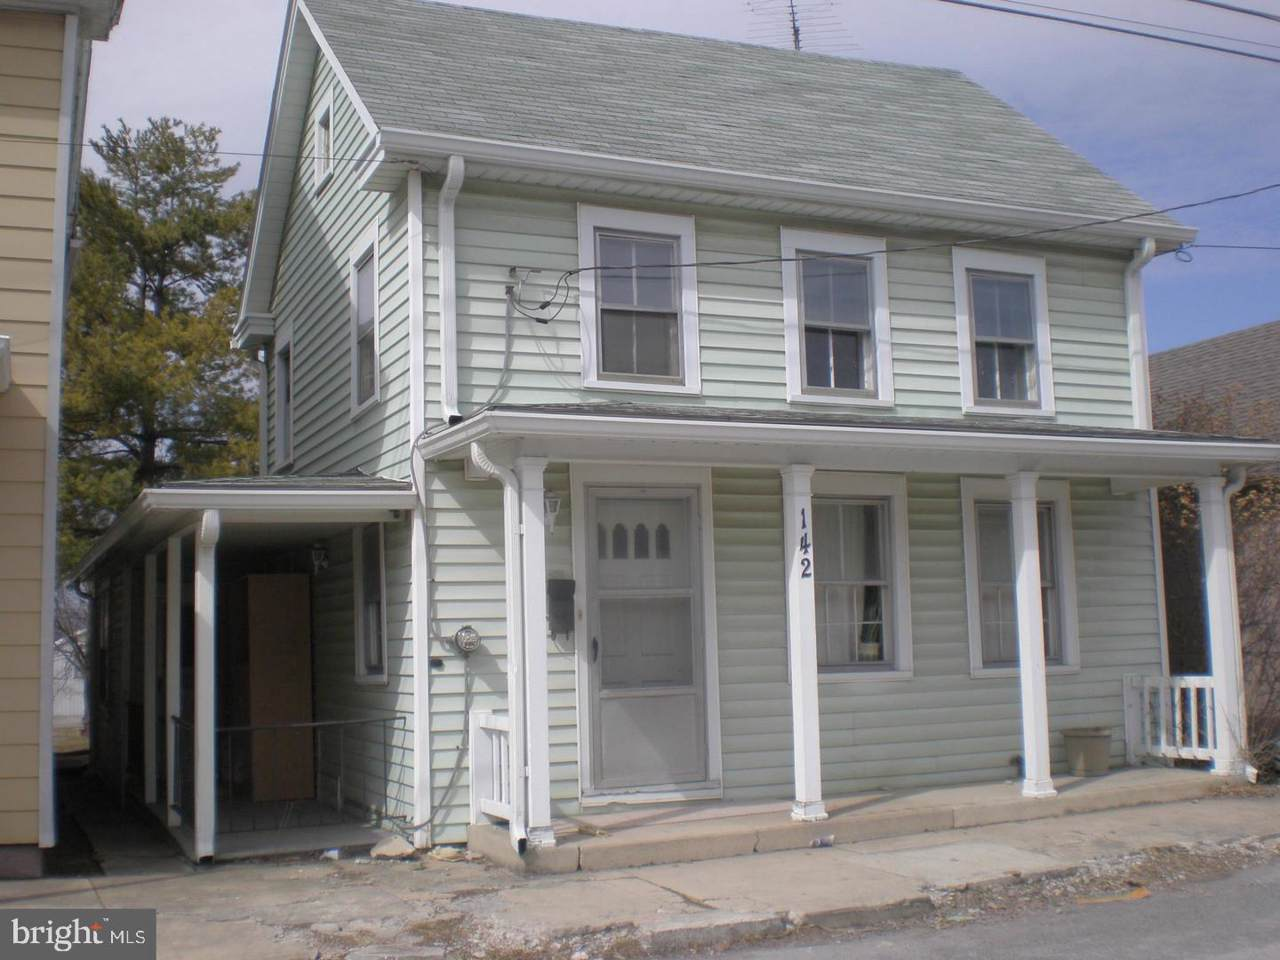 142 Washington Street - Photo 1